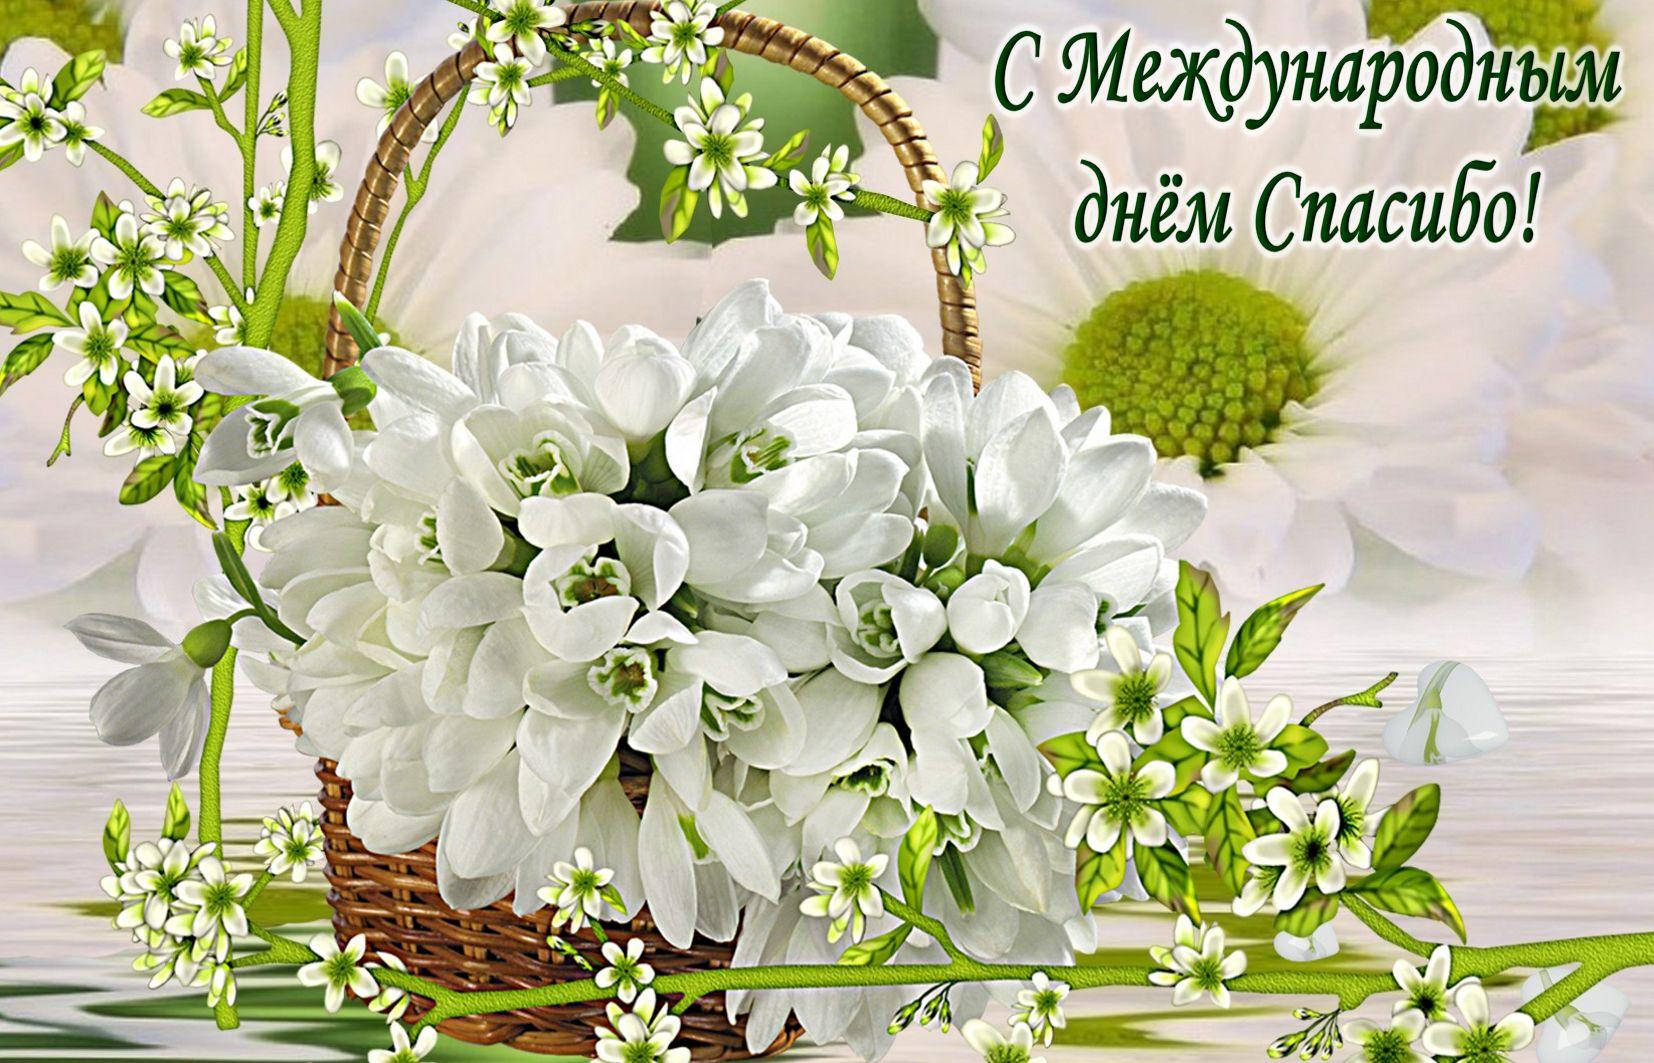 Открытка на День спасибо - корзина с белыми цветами на красивом фоне